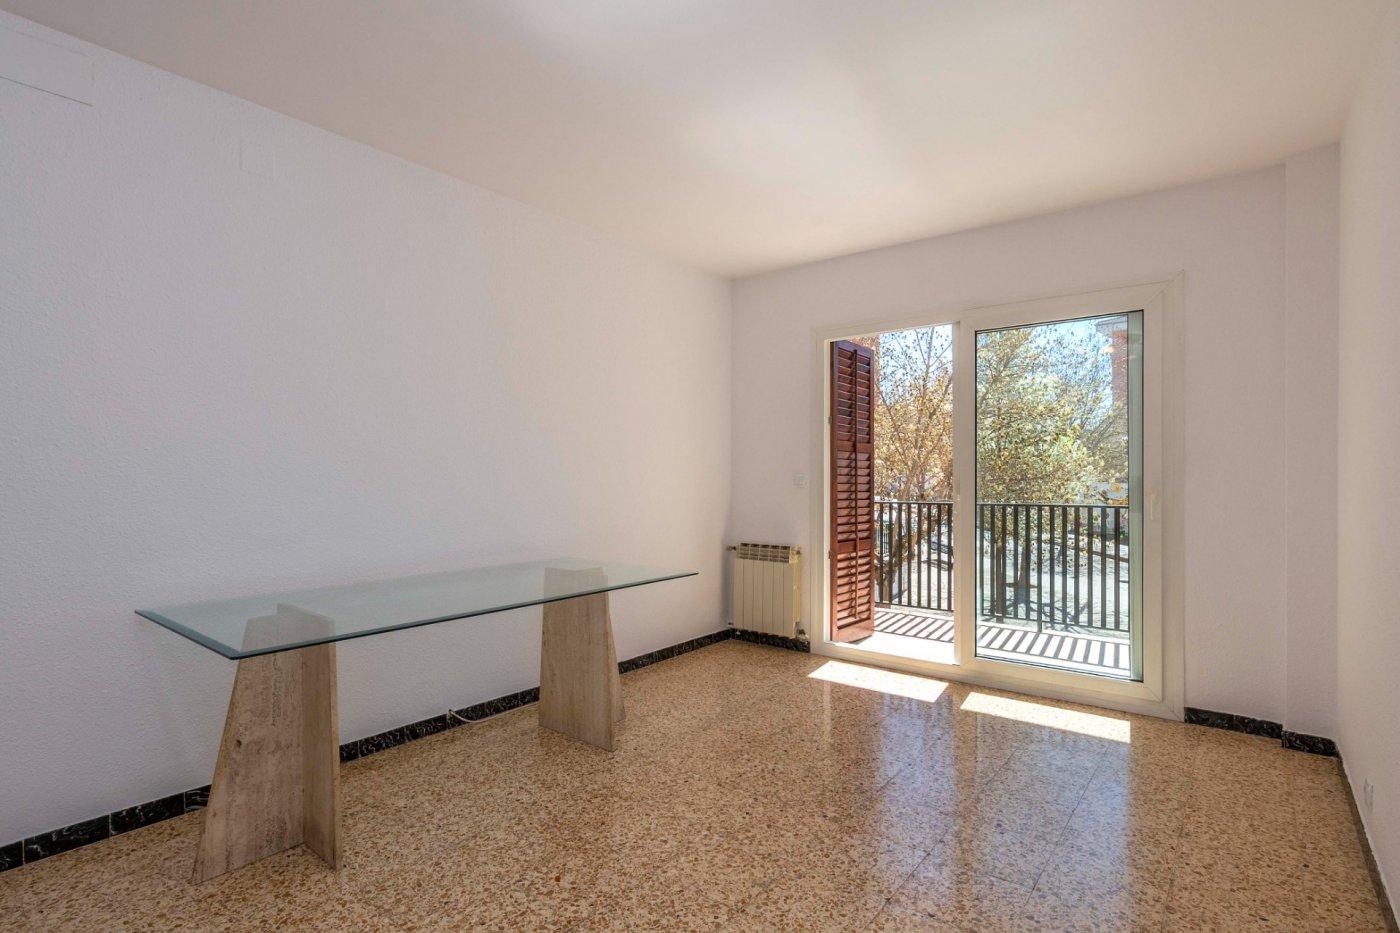 Pis venda a Manresa - La Balconada